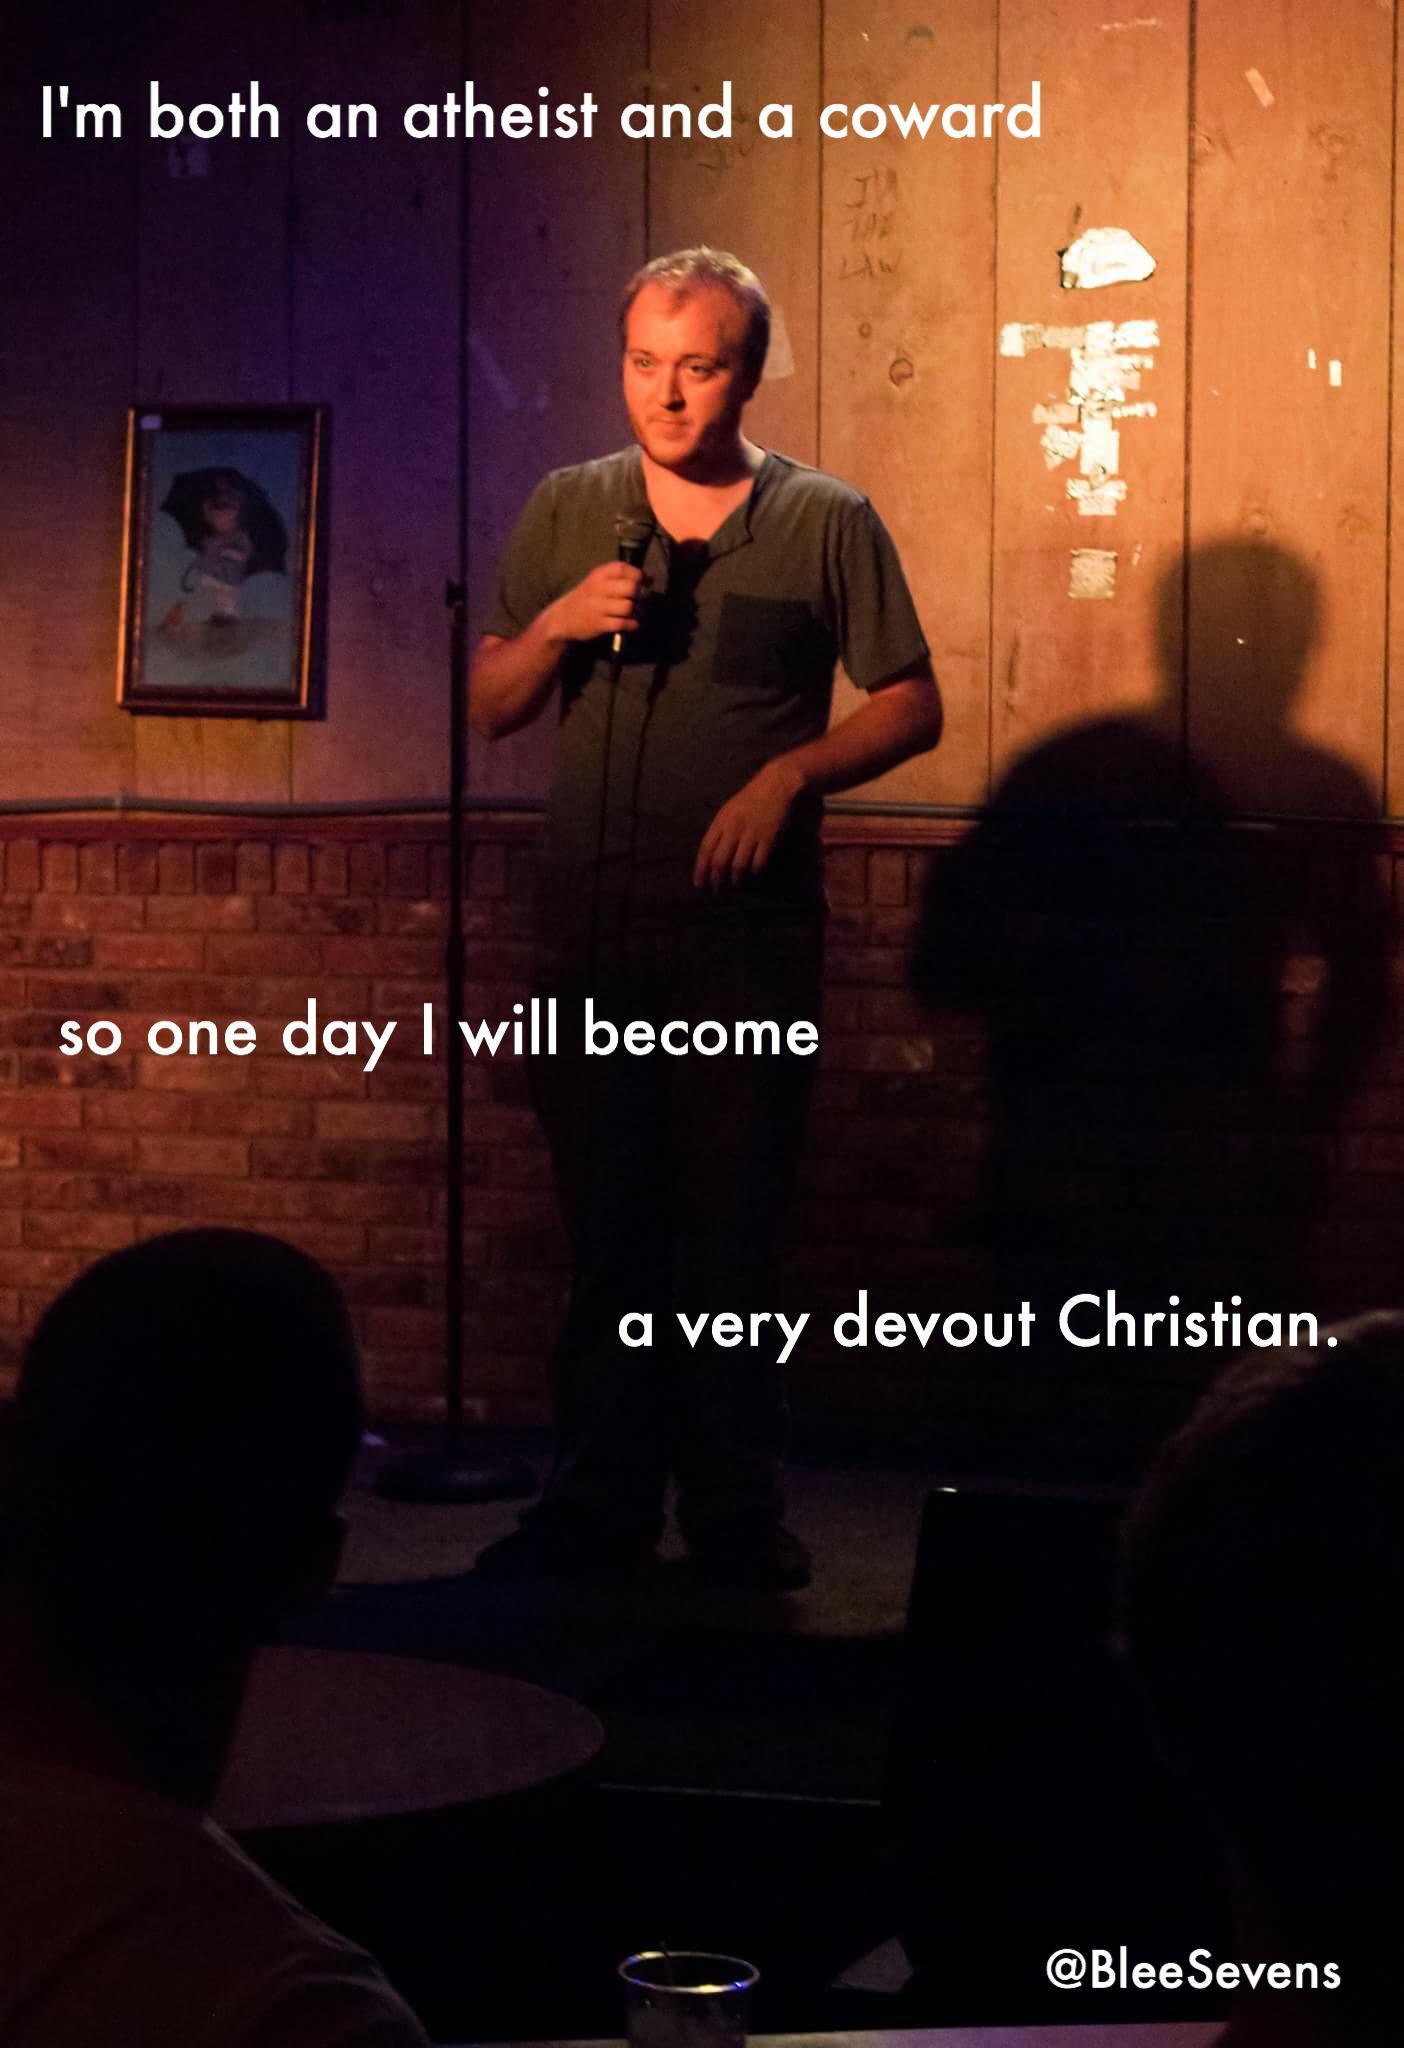 Dating Photos Atheist Toronto Singles In